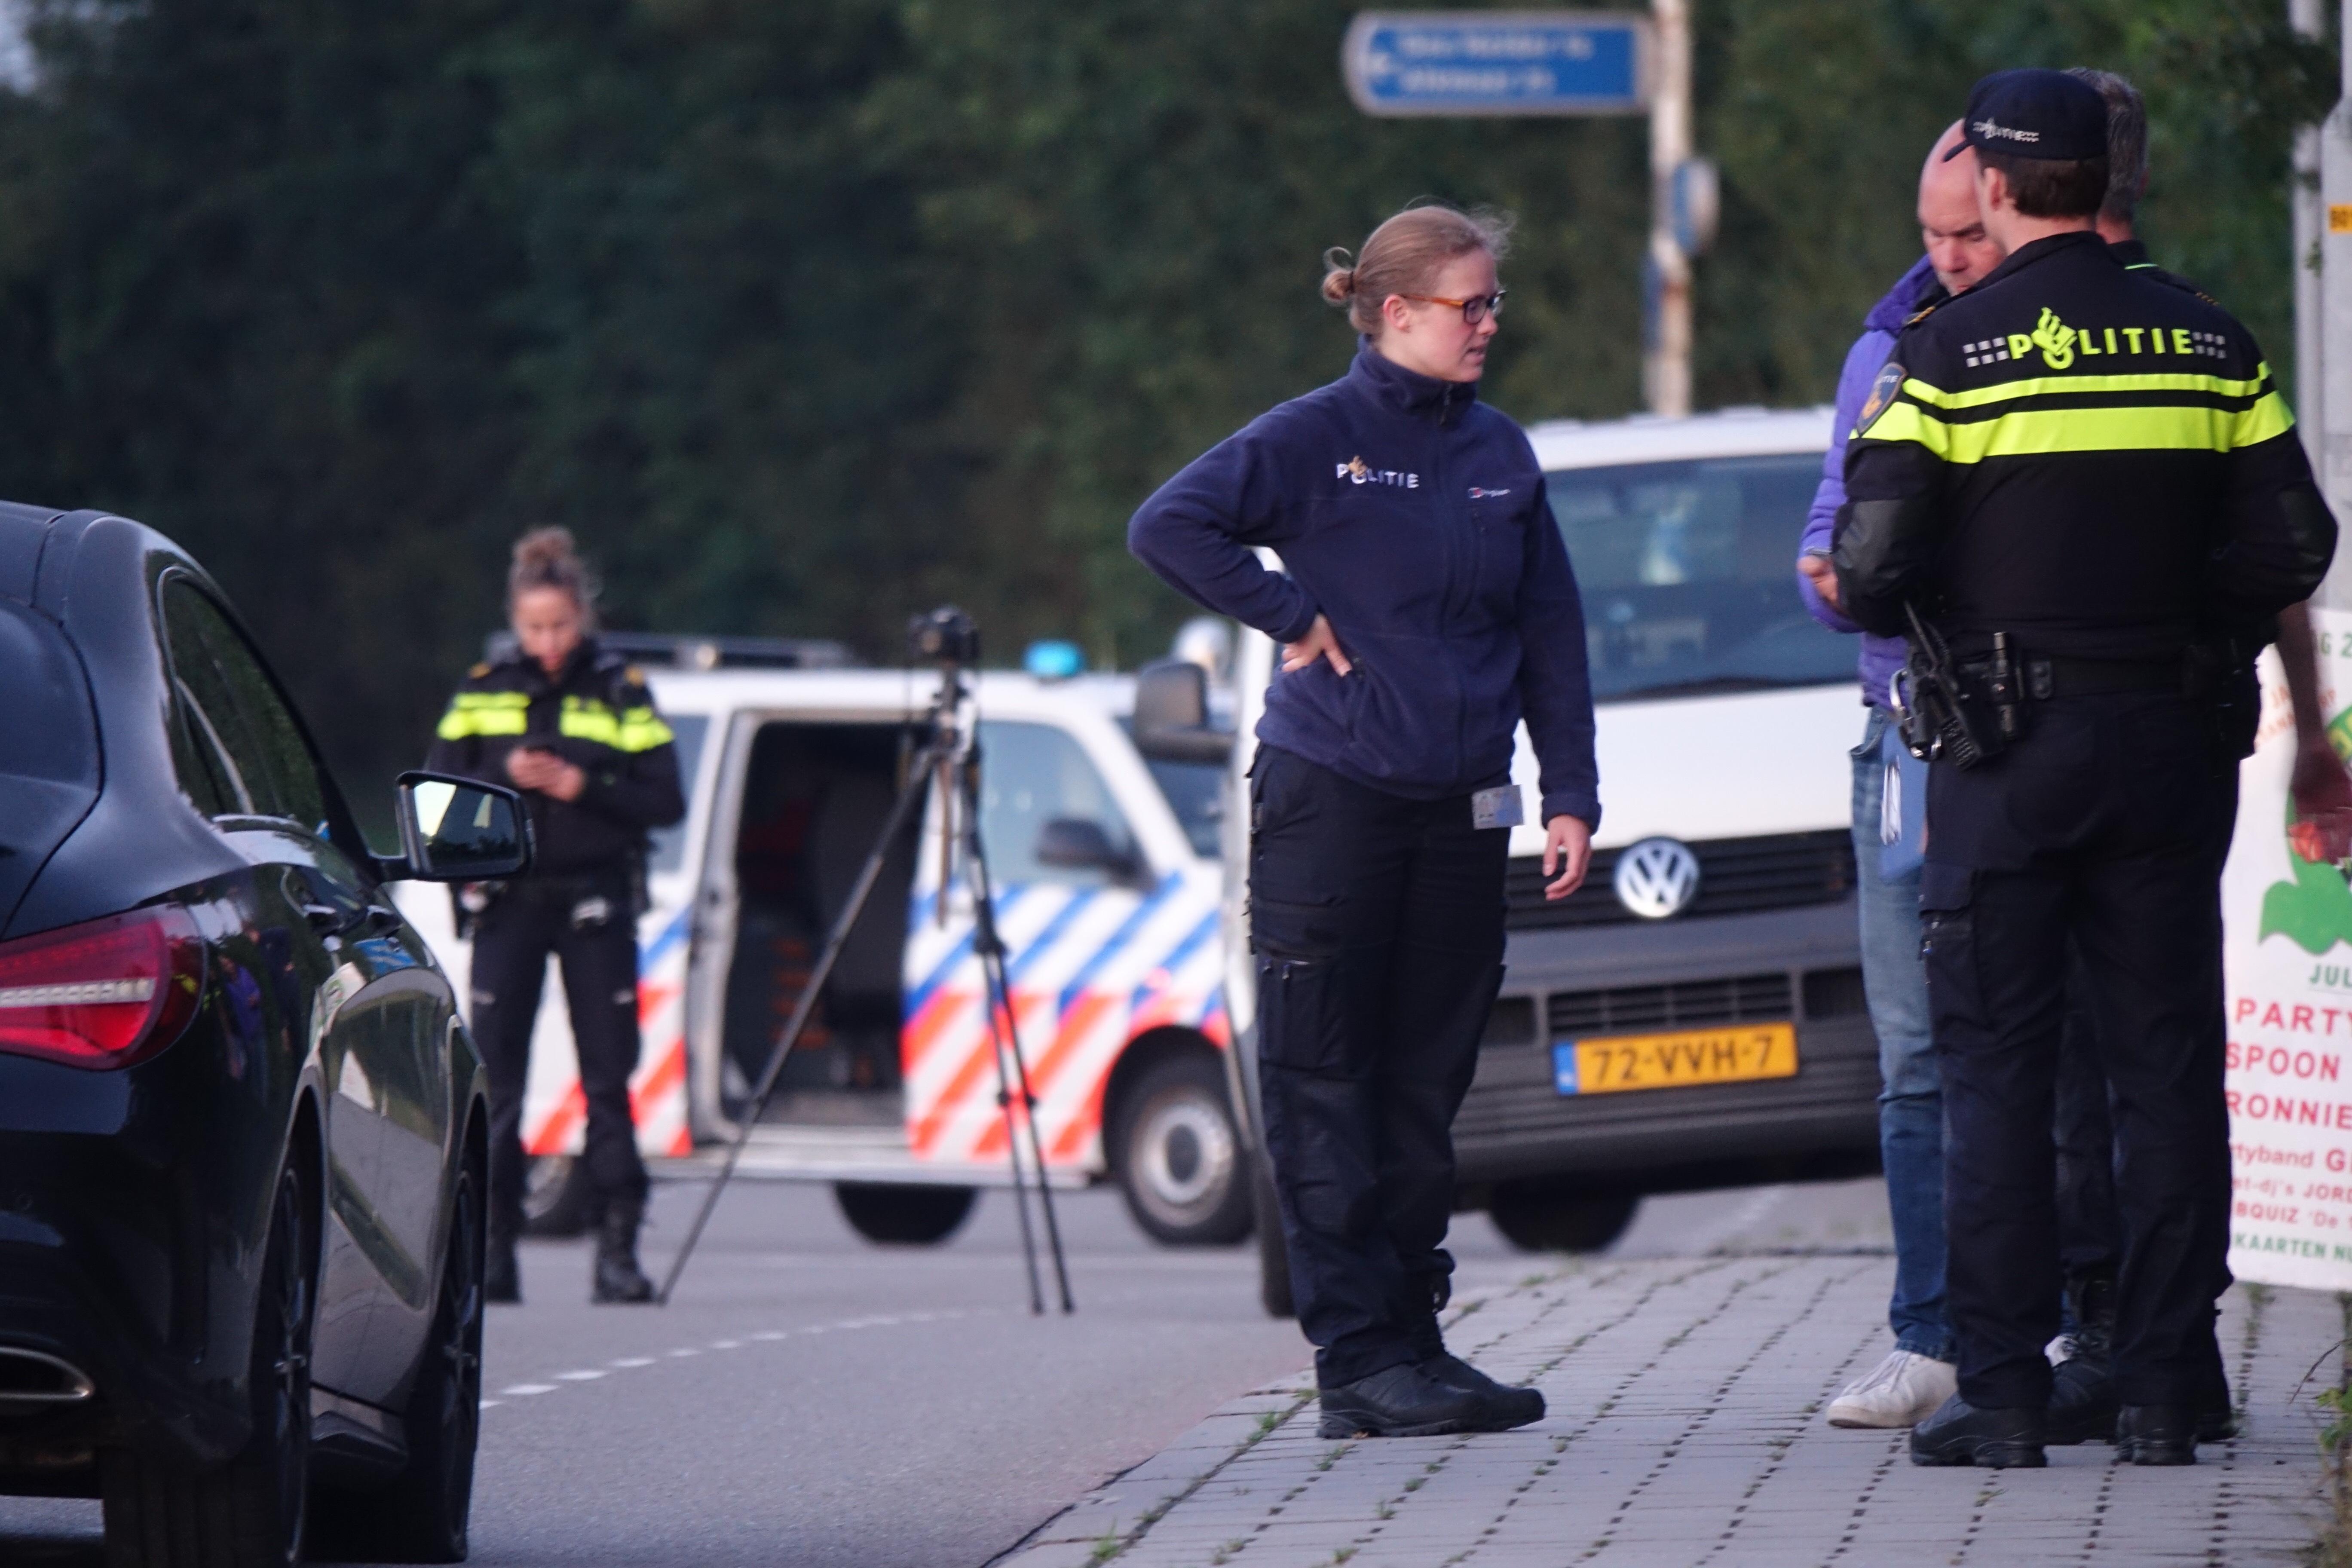 Auto Alkmaarder beschoten in 't Zand